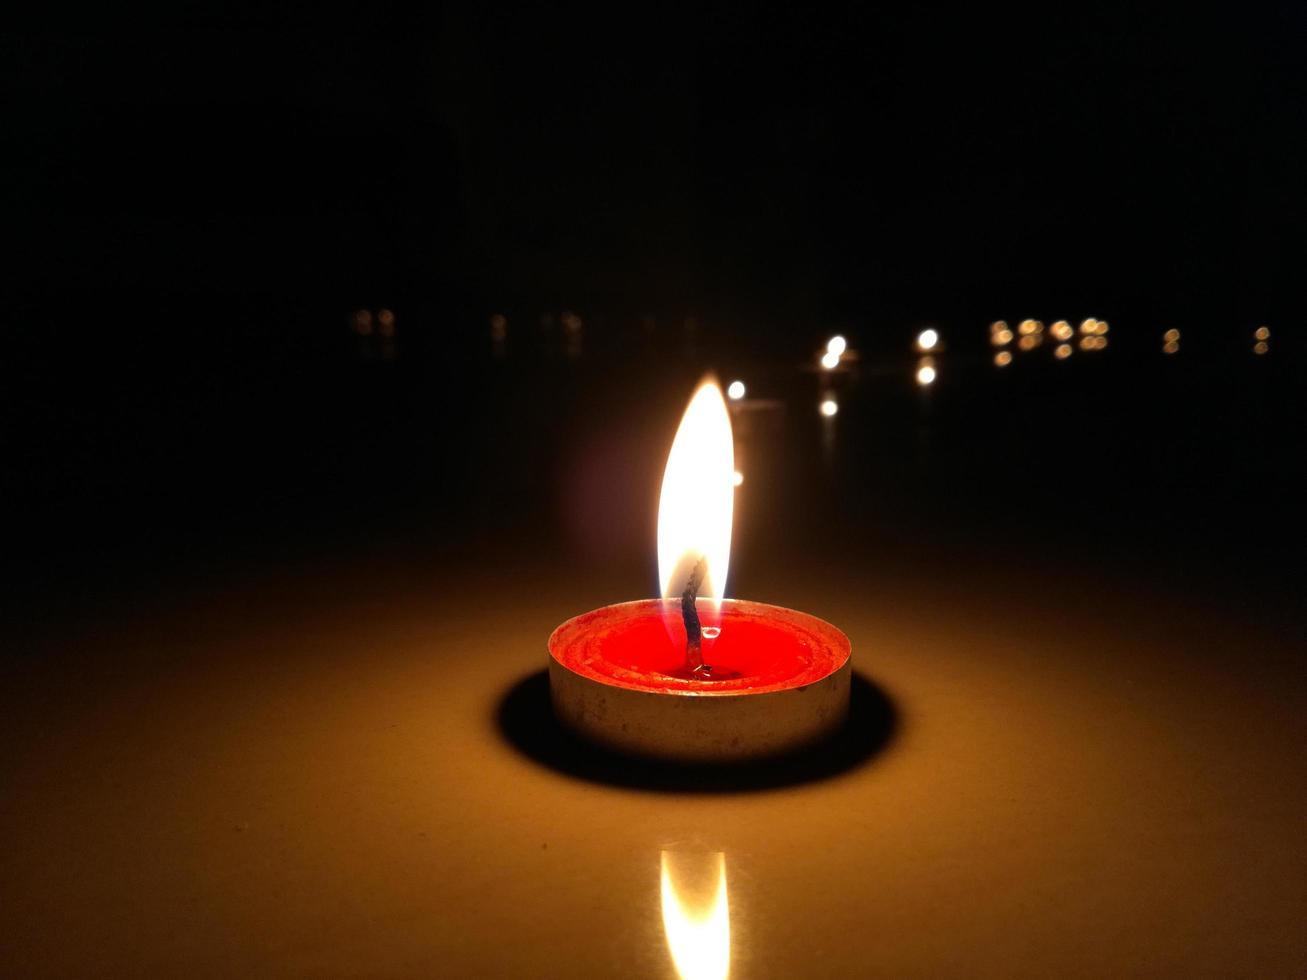 piccola candela rossa foto